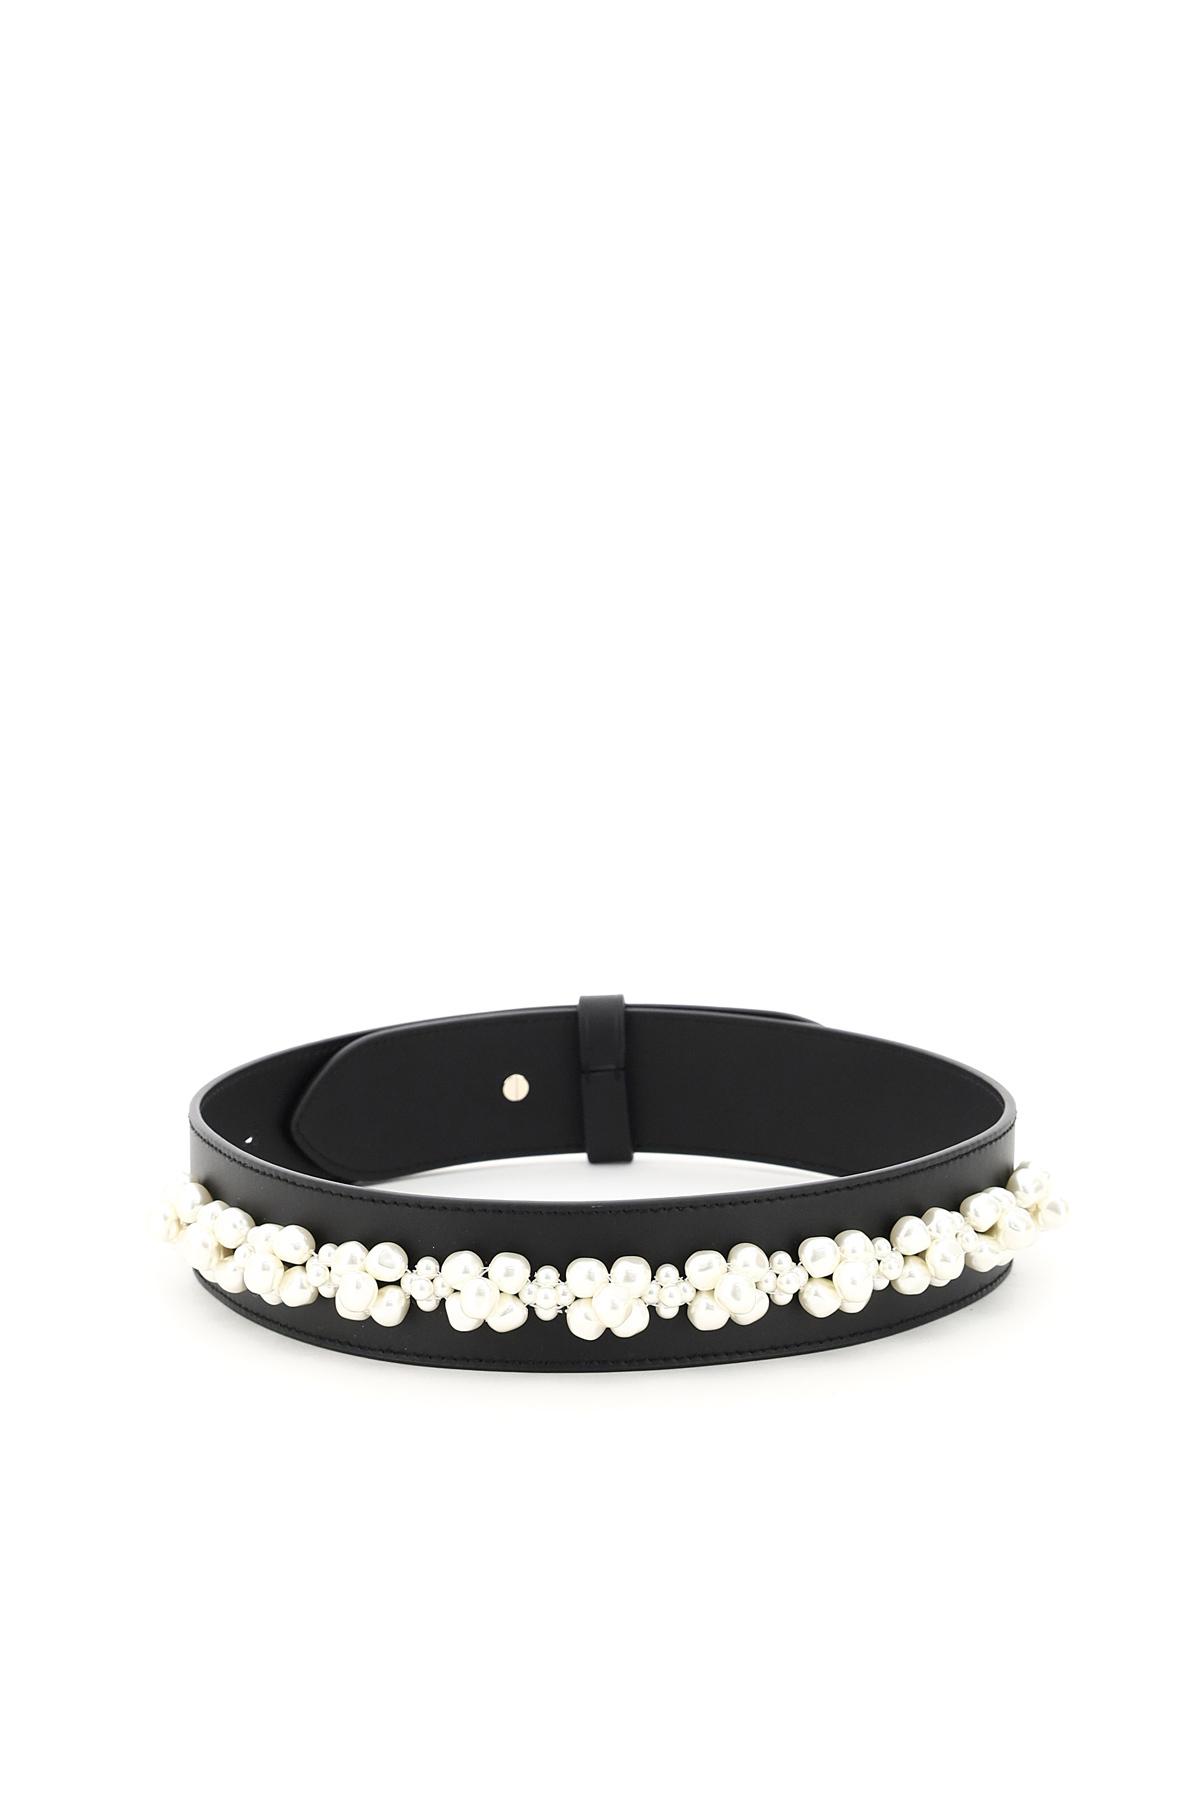 Simone rocha cintura in pelle embellished pearls